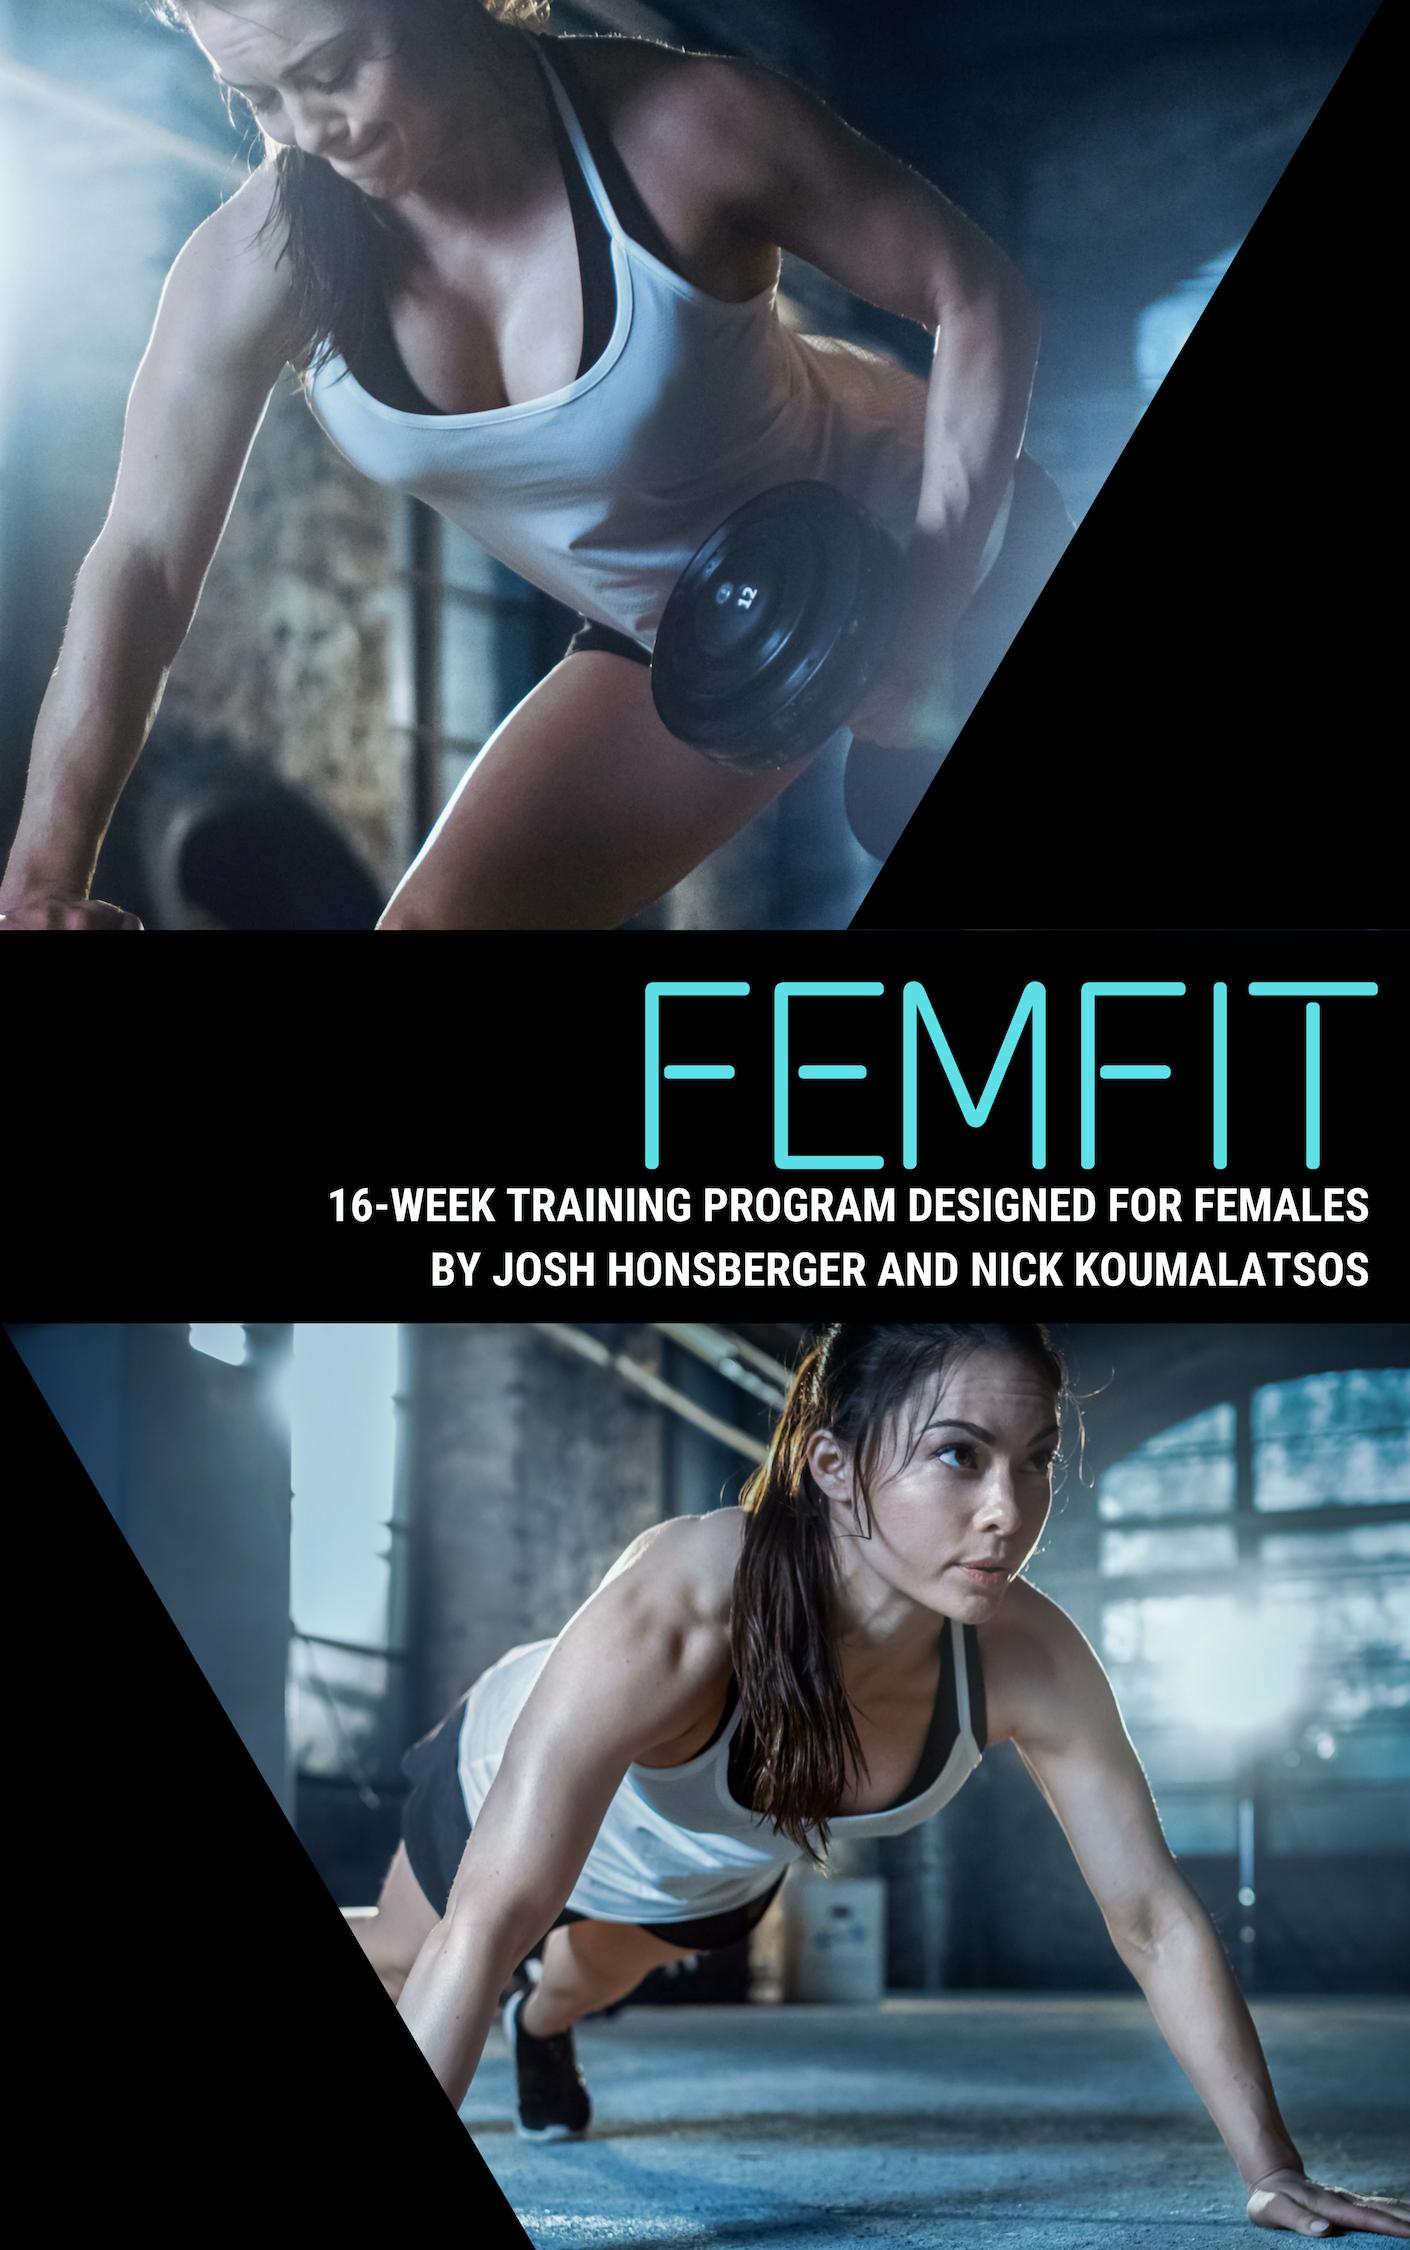 FEMFIT 16 Week Female Training Program  - Available for PRE-SALE